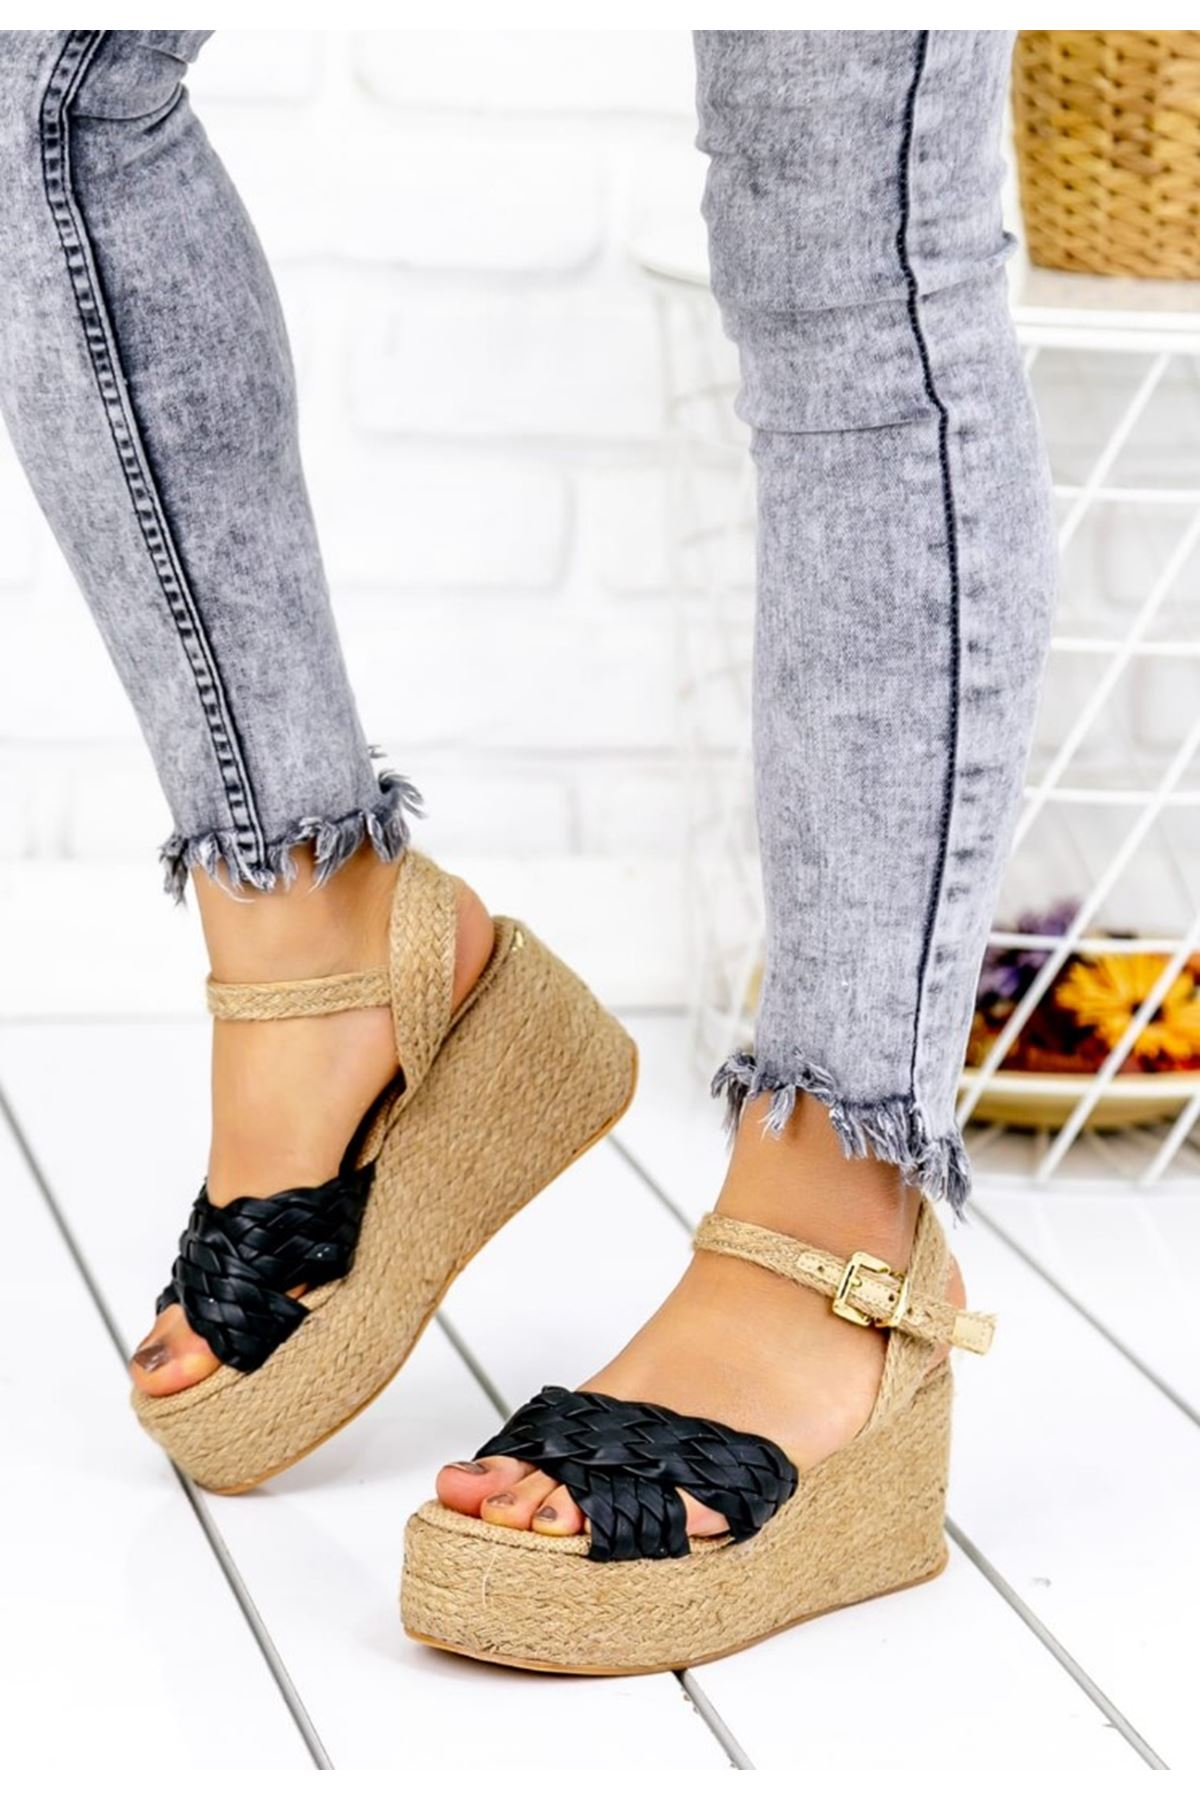 Frida Mat Deri Çapraz Bant Dolgu Topuk Ayakkabı Siyah